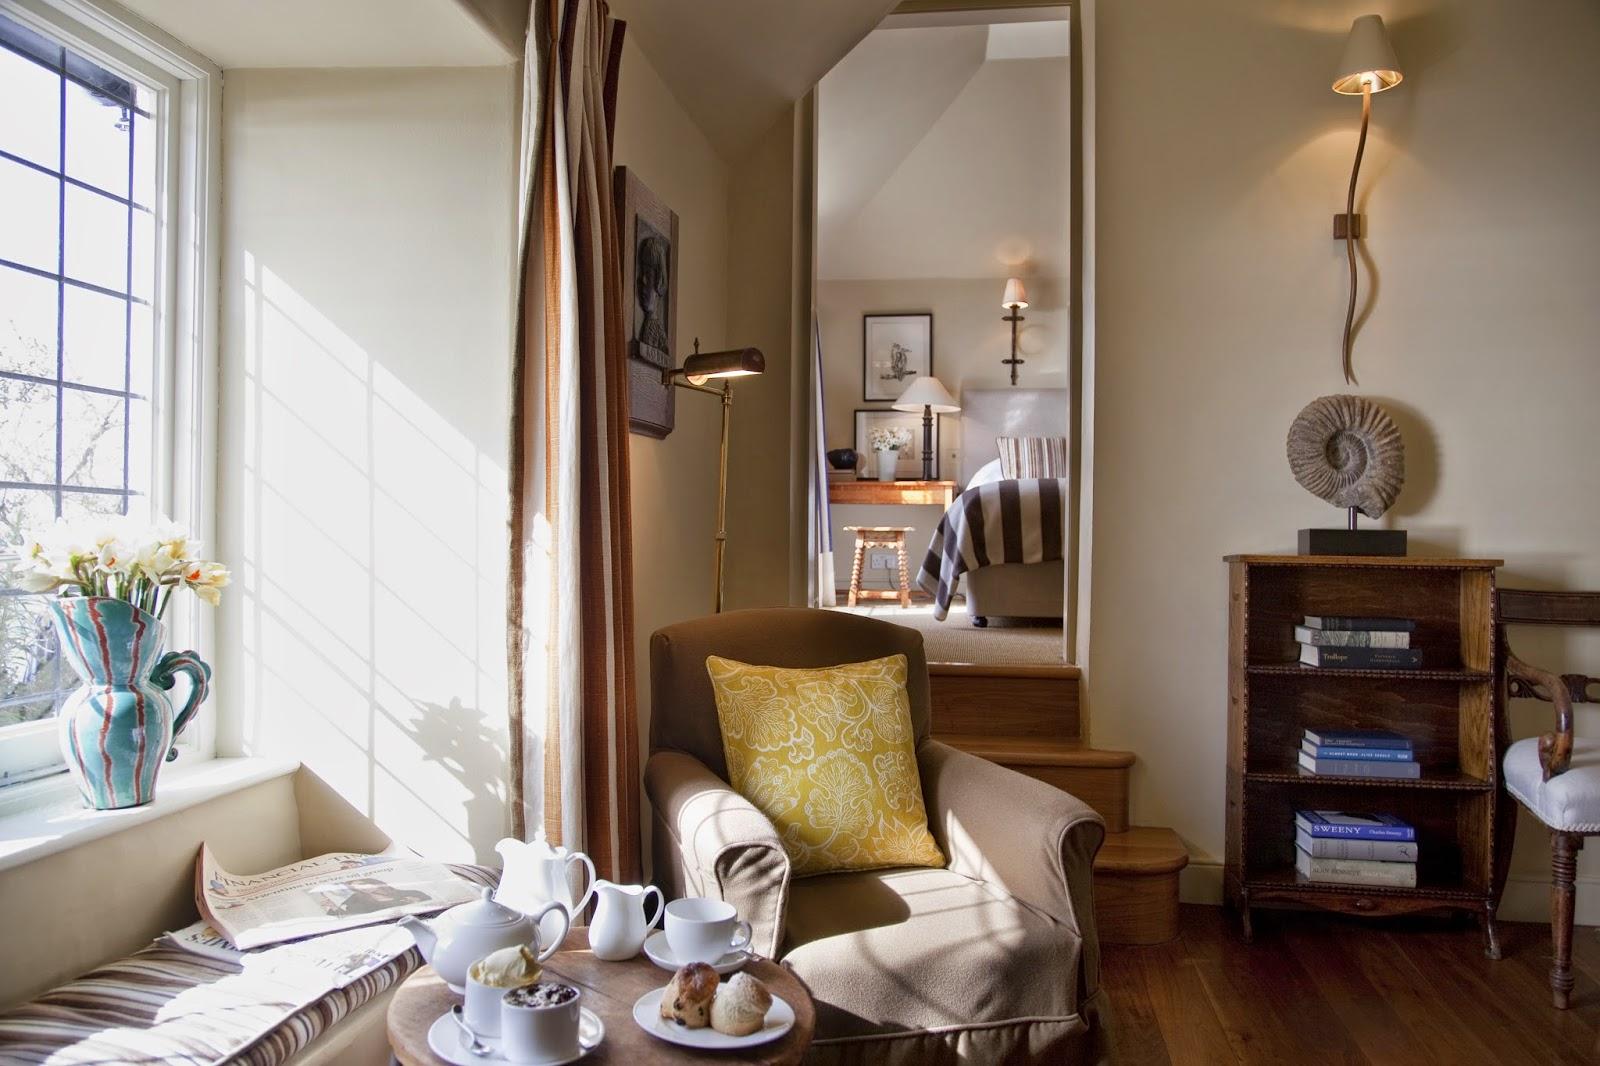 Hotel Tresanton (Cornwall)